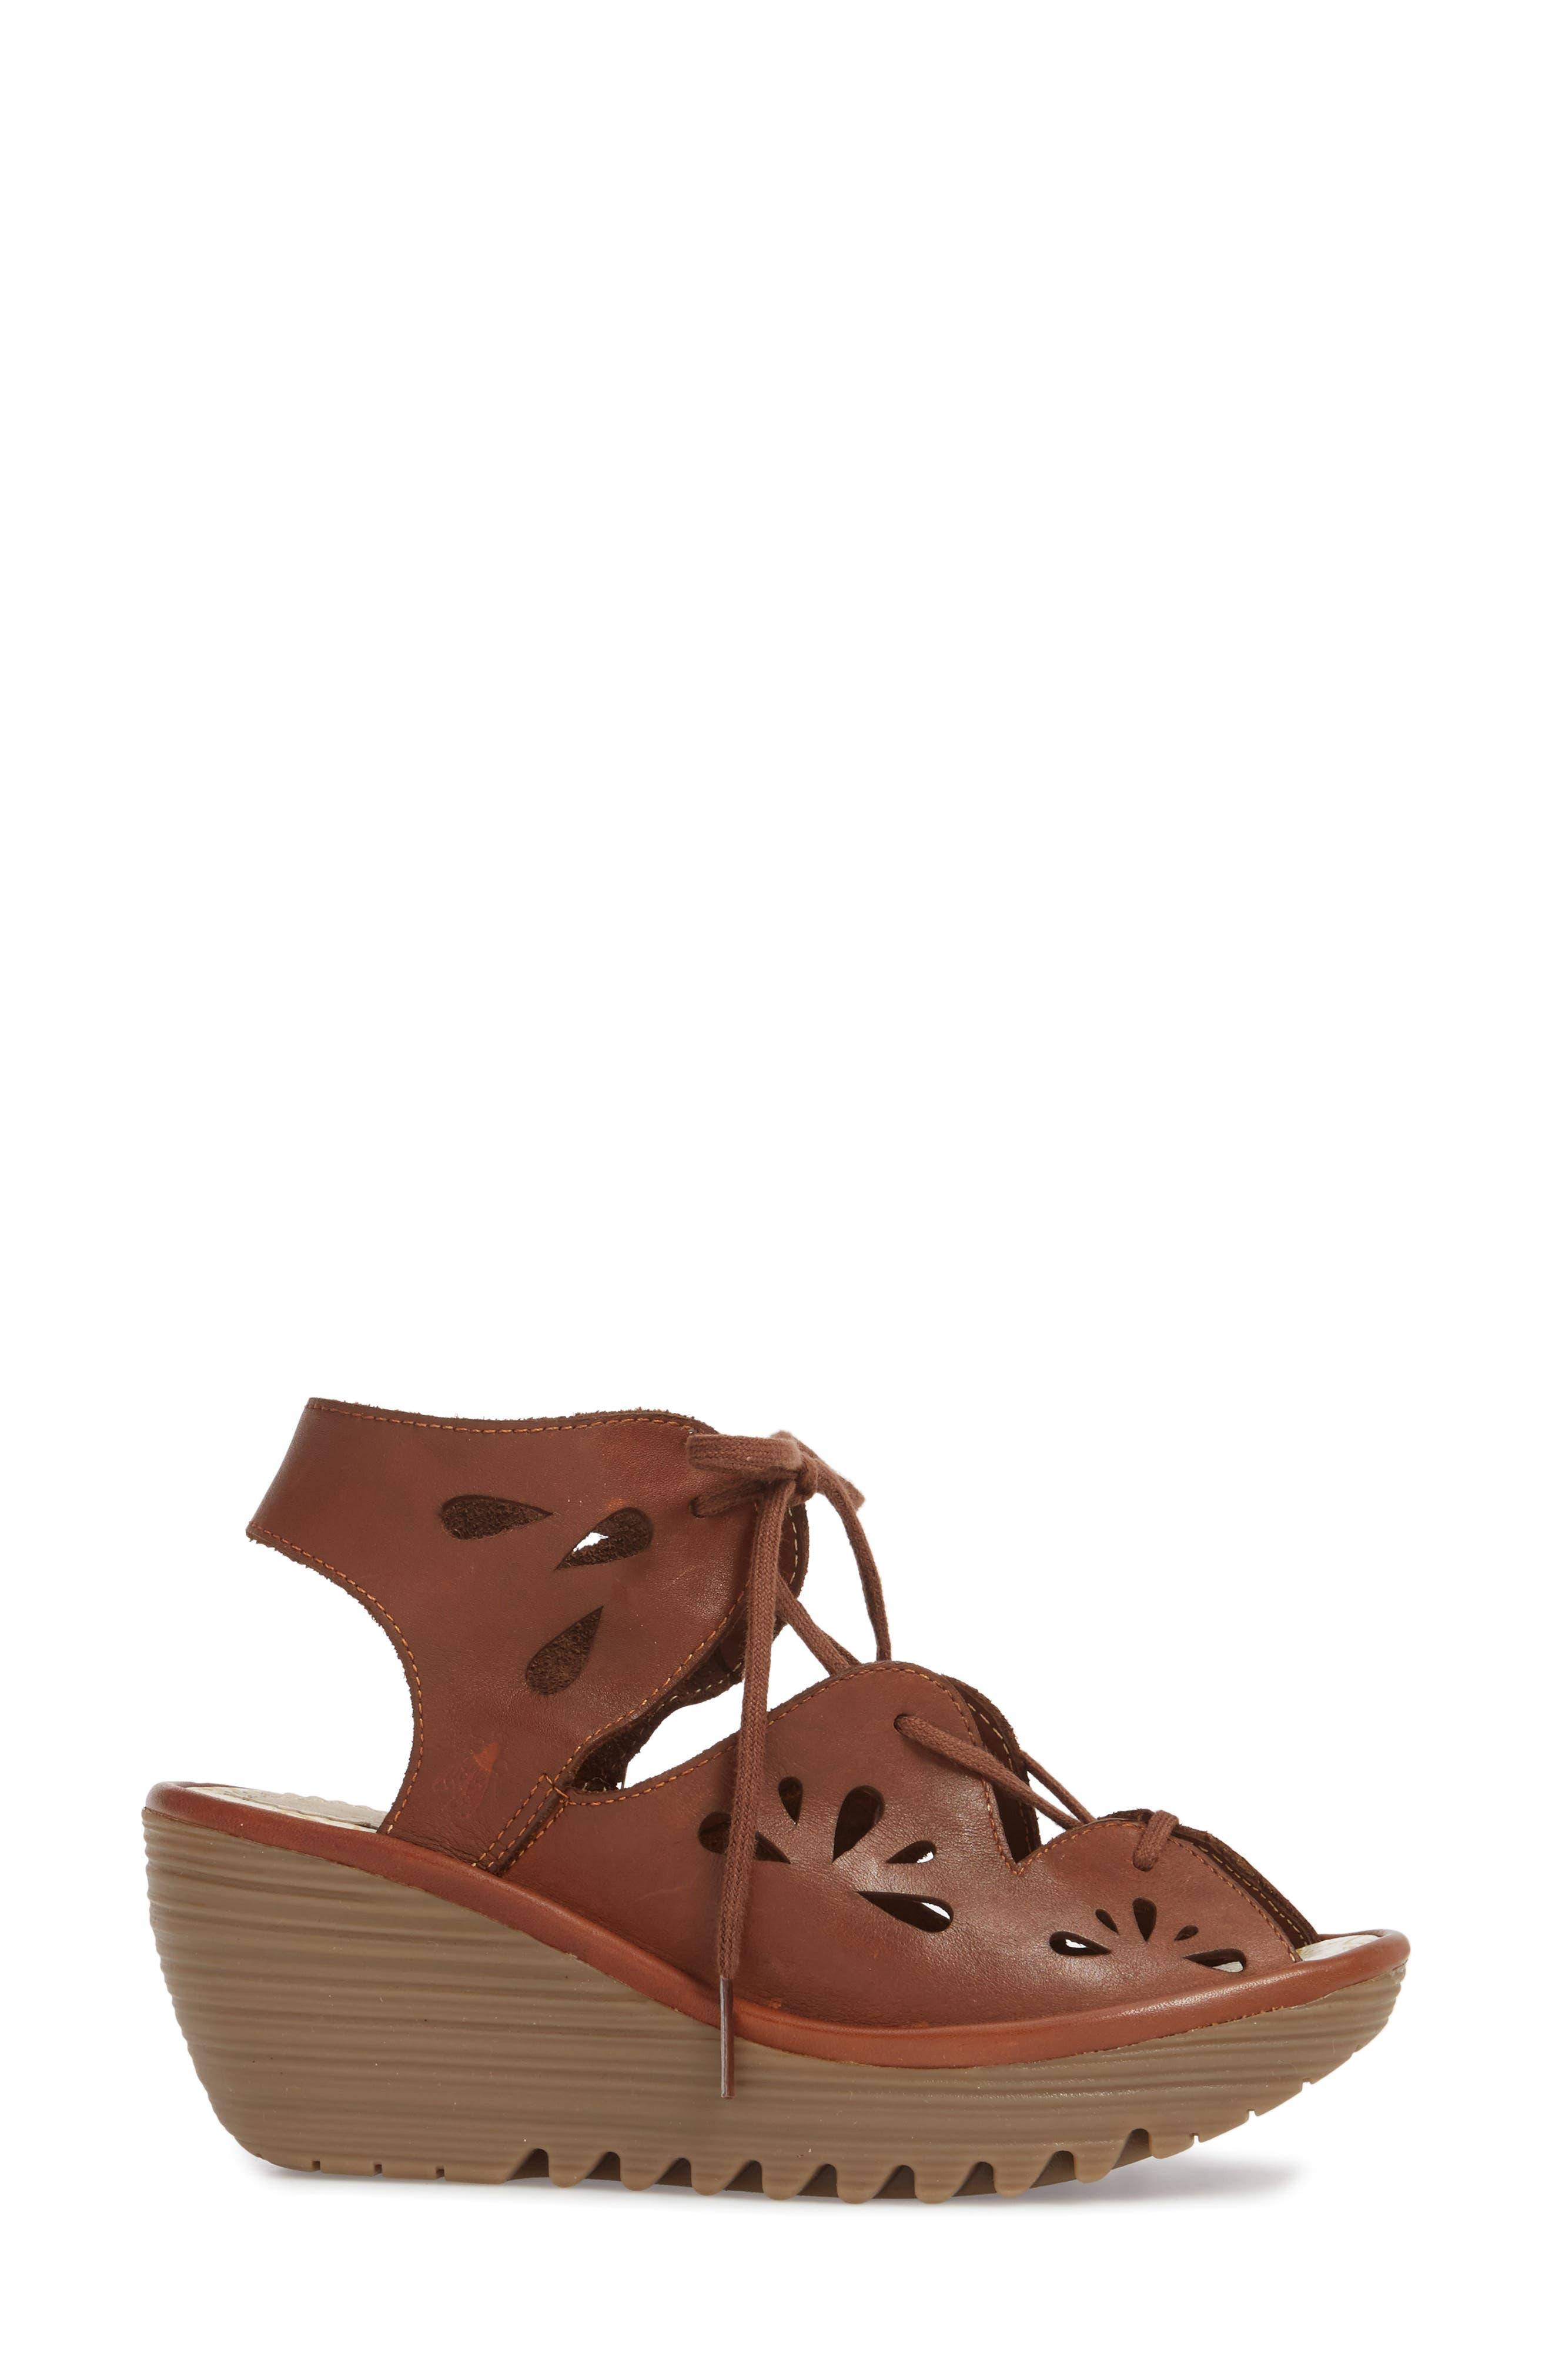 Yote Sandal,                             Alternate thumbnail 3, color,                             Brown Colmar Leather